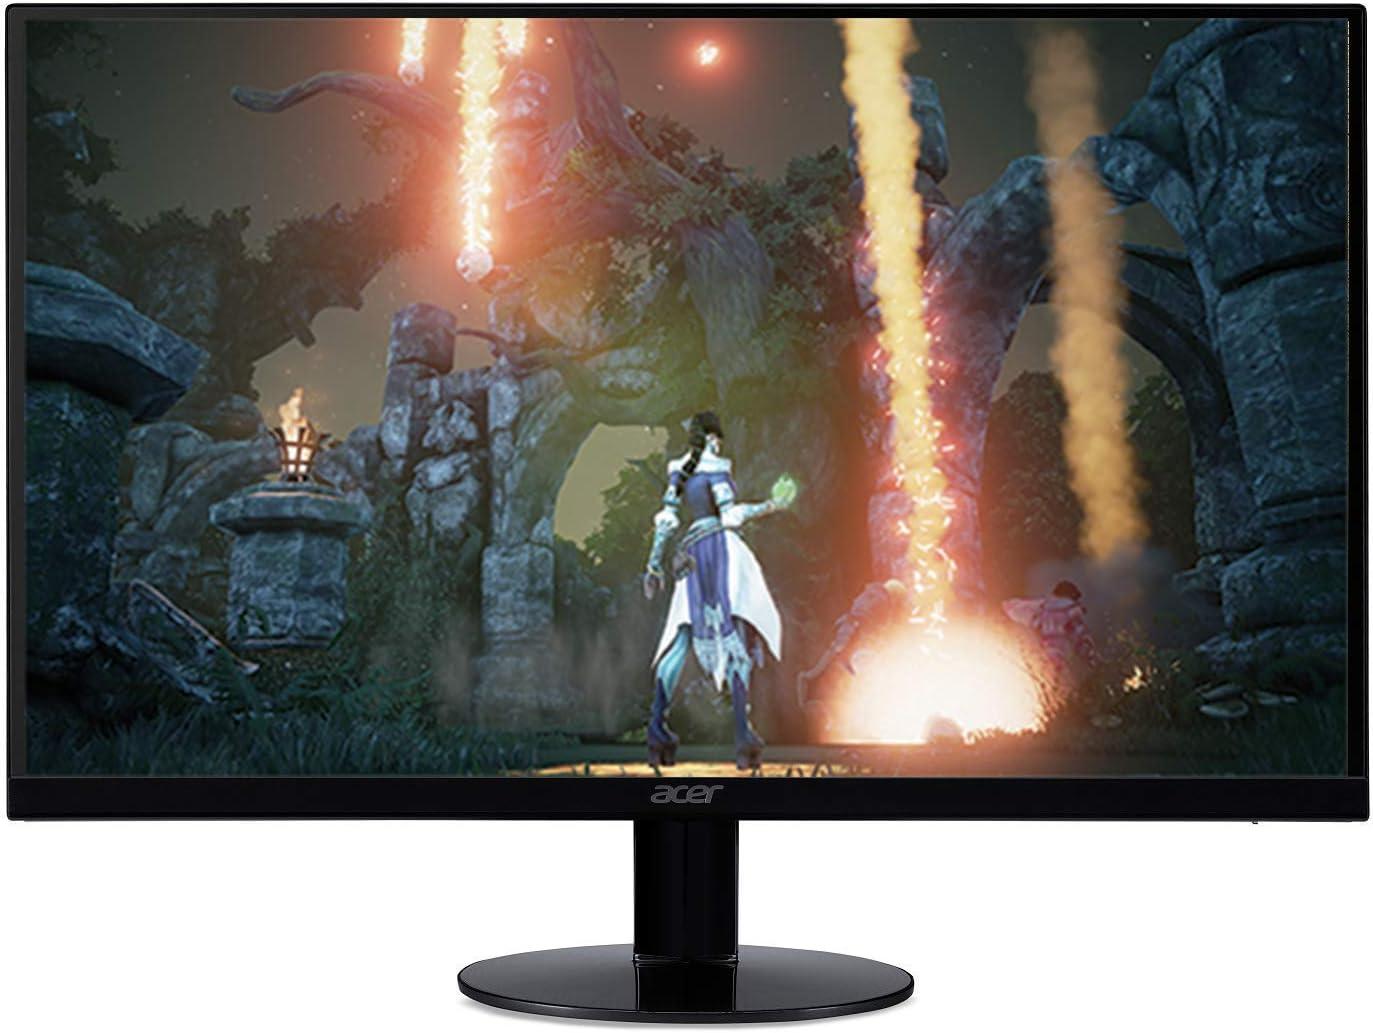 Acer SB0 23in Widescreen Monitor Display Full HD 1920 x 1080 1 ms 75 Hz IPS (Renewed)